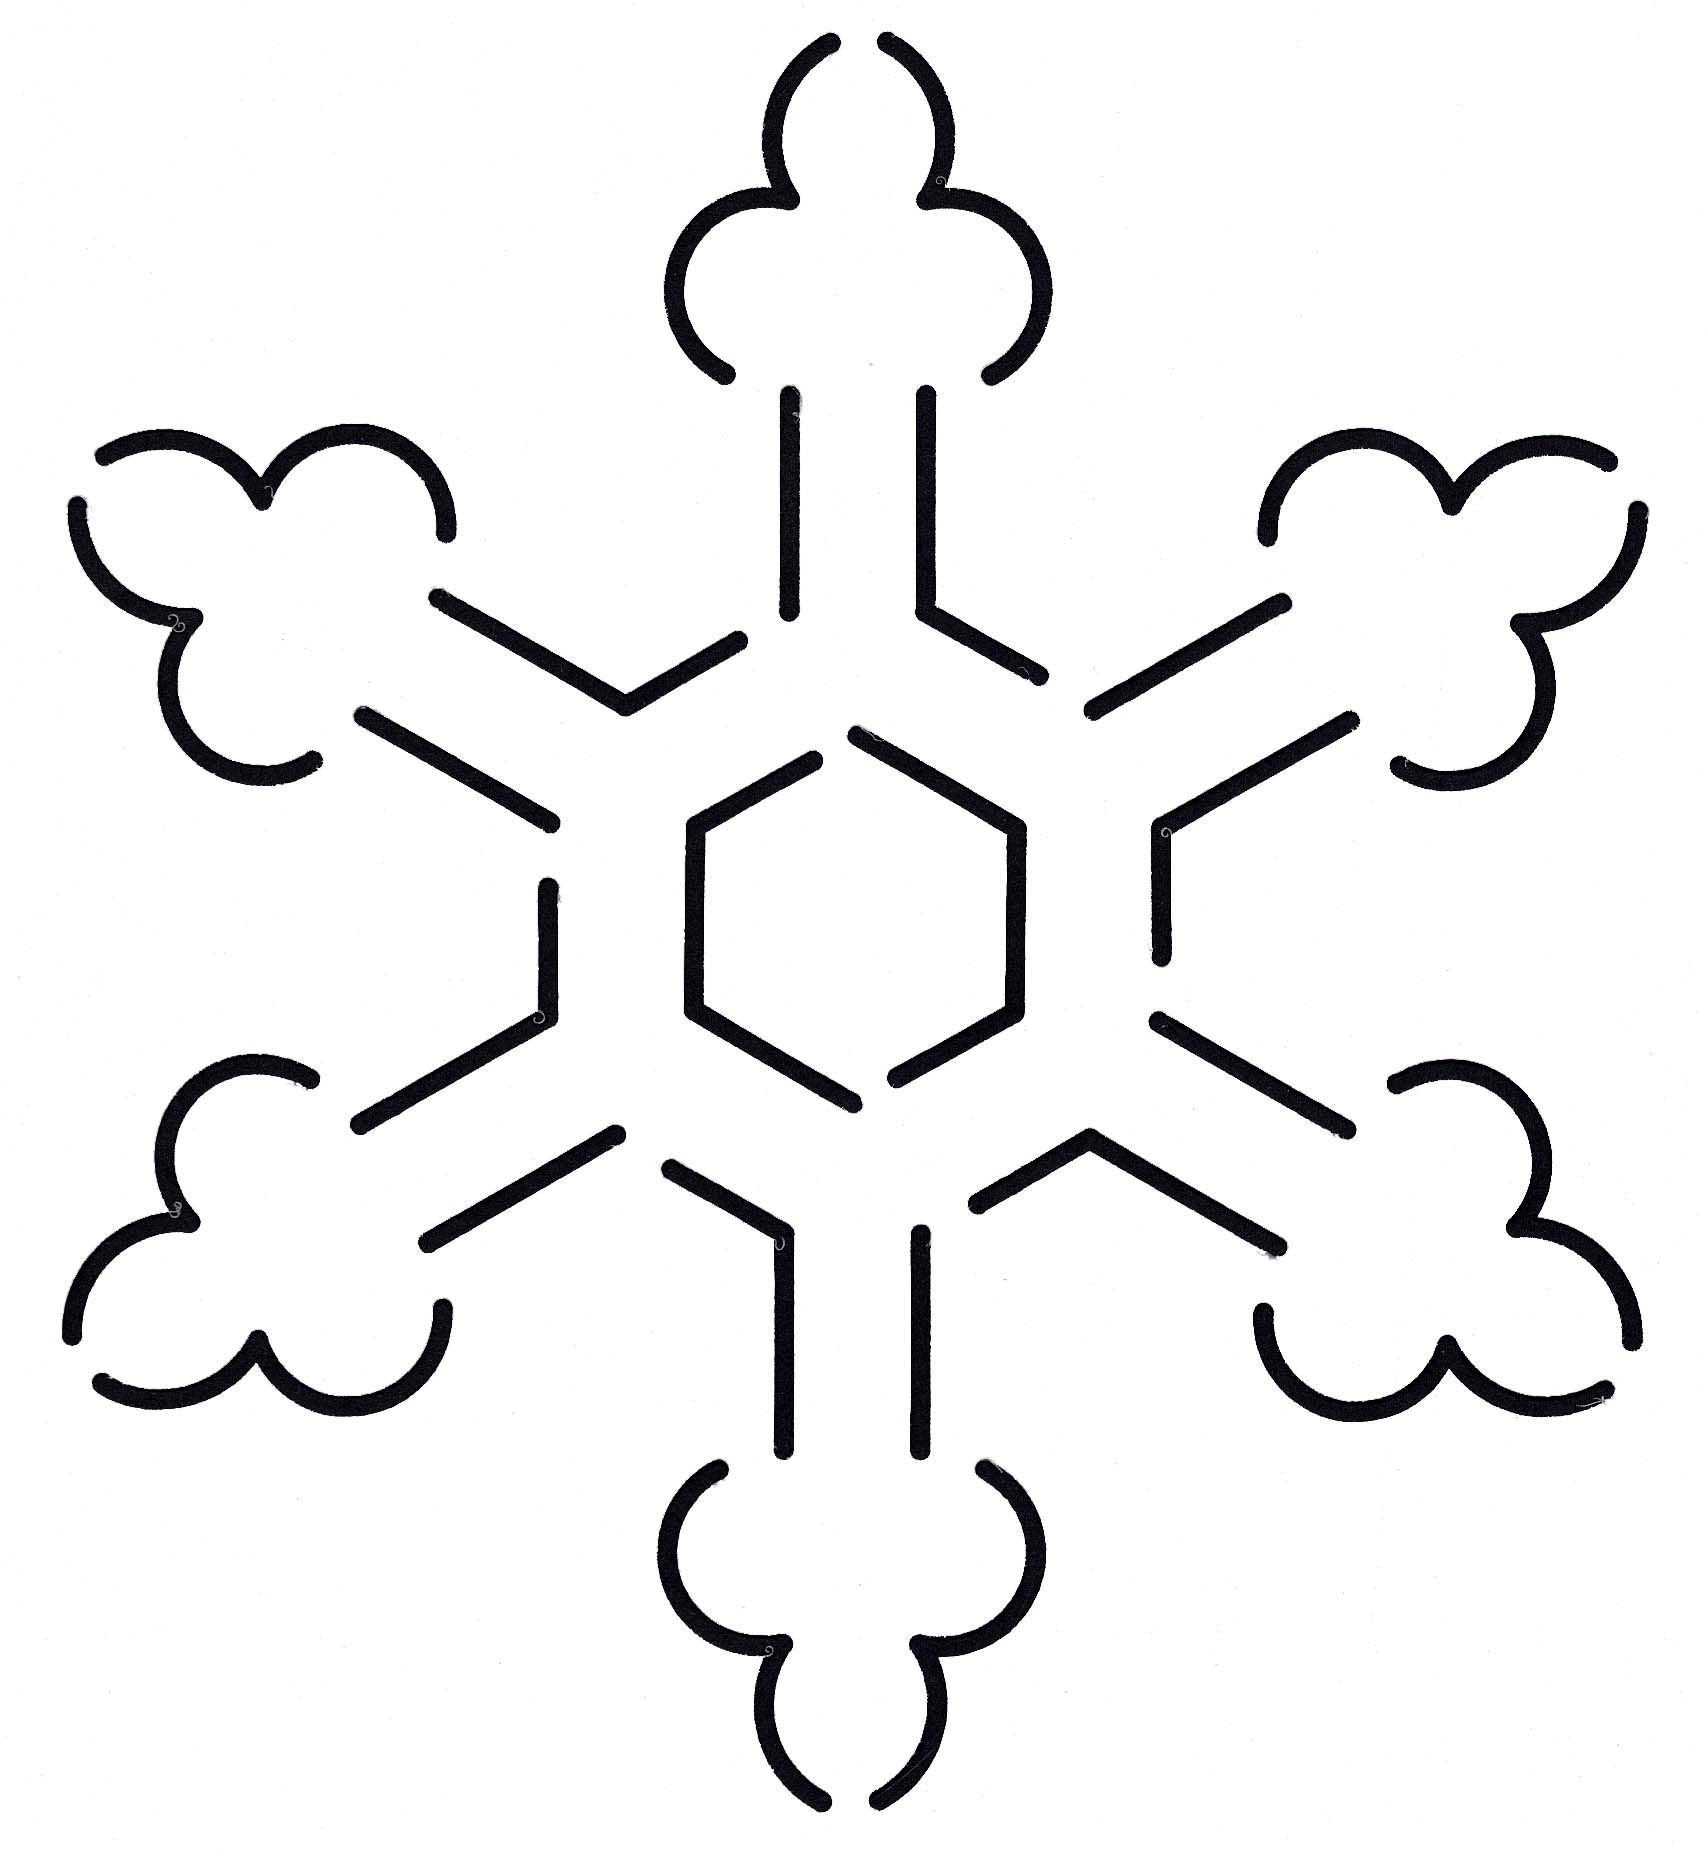 Quilt Stencil Snowflake 5-1/4in x 6in | Stenciling, Applique ... : snowflake quilting stencil - Adamdwight.com